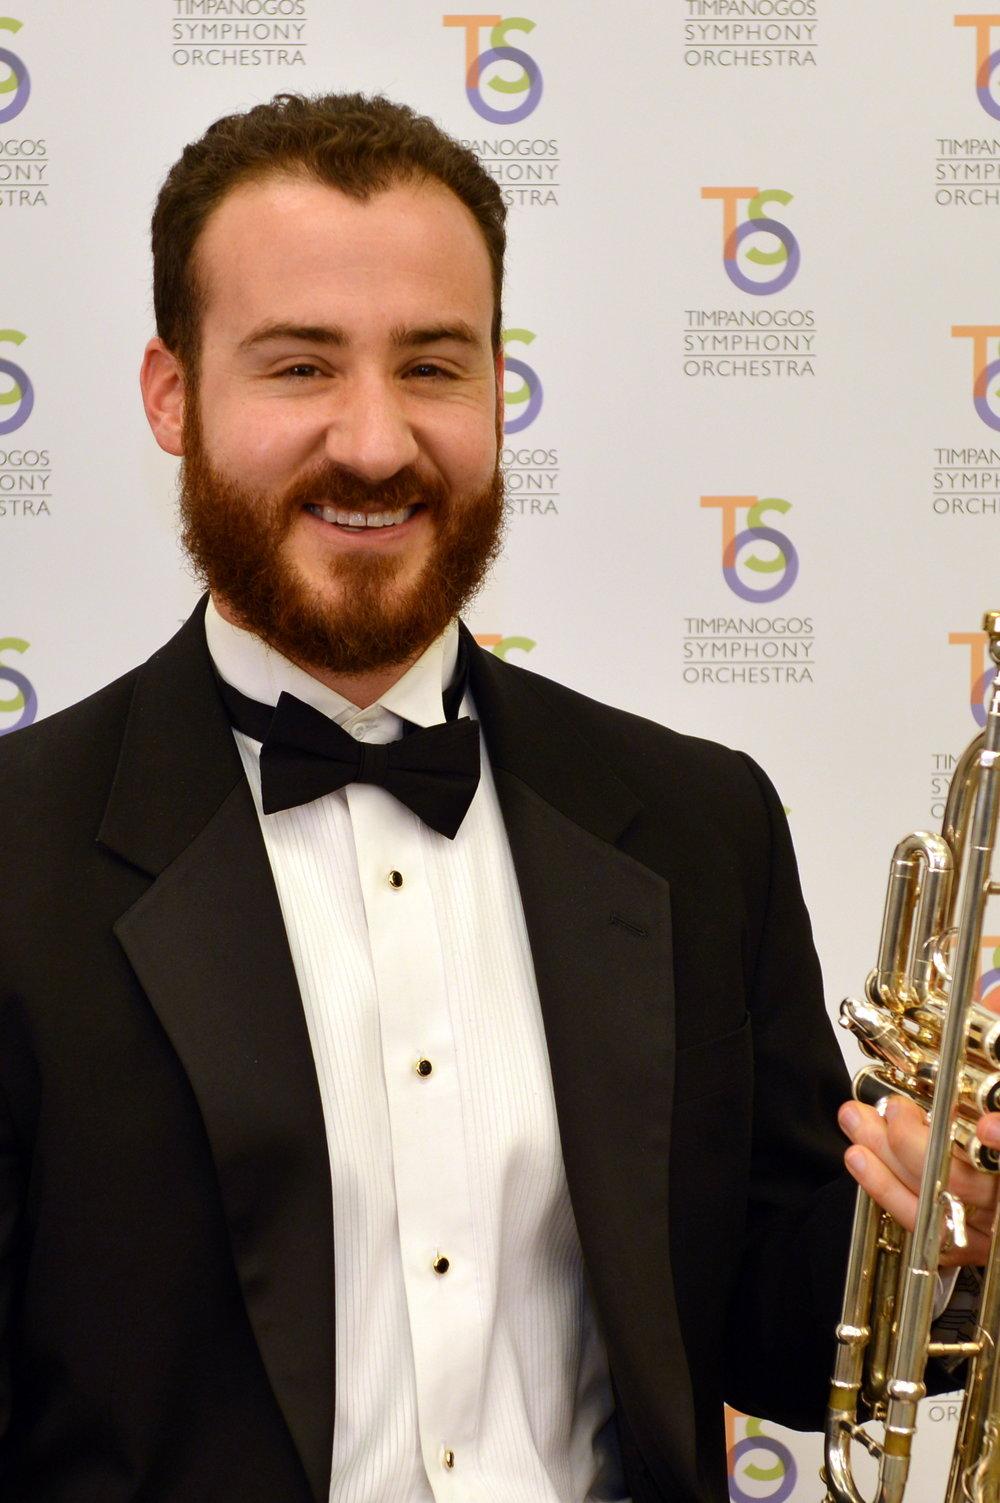 Benjamin Russell , 2nd Trumpet